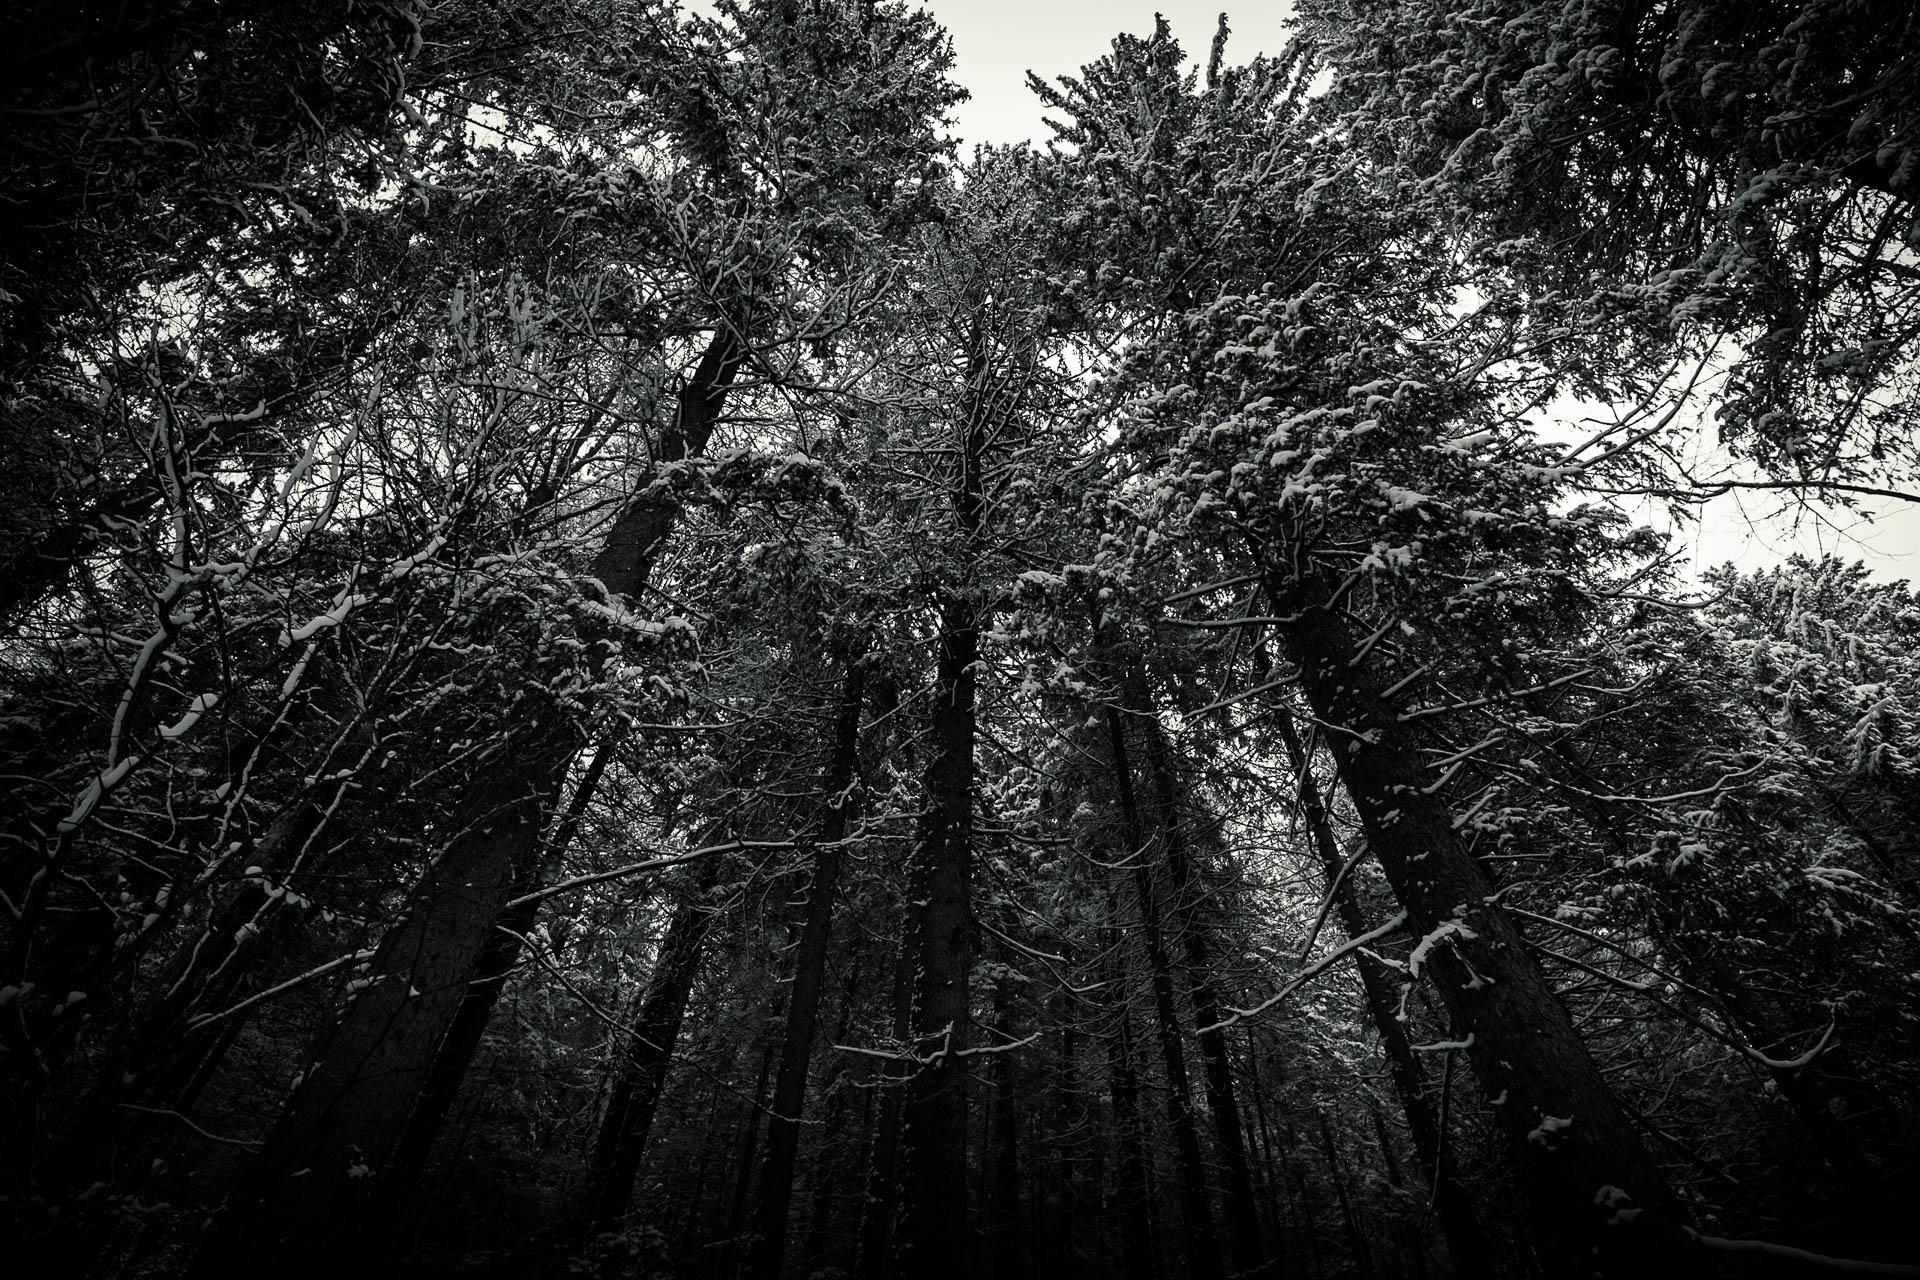 Treeview am Eibsee im Winter